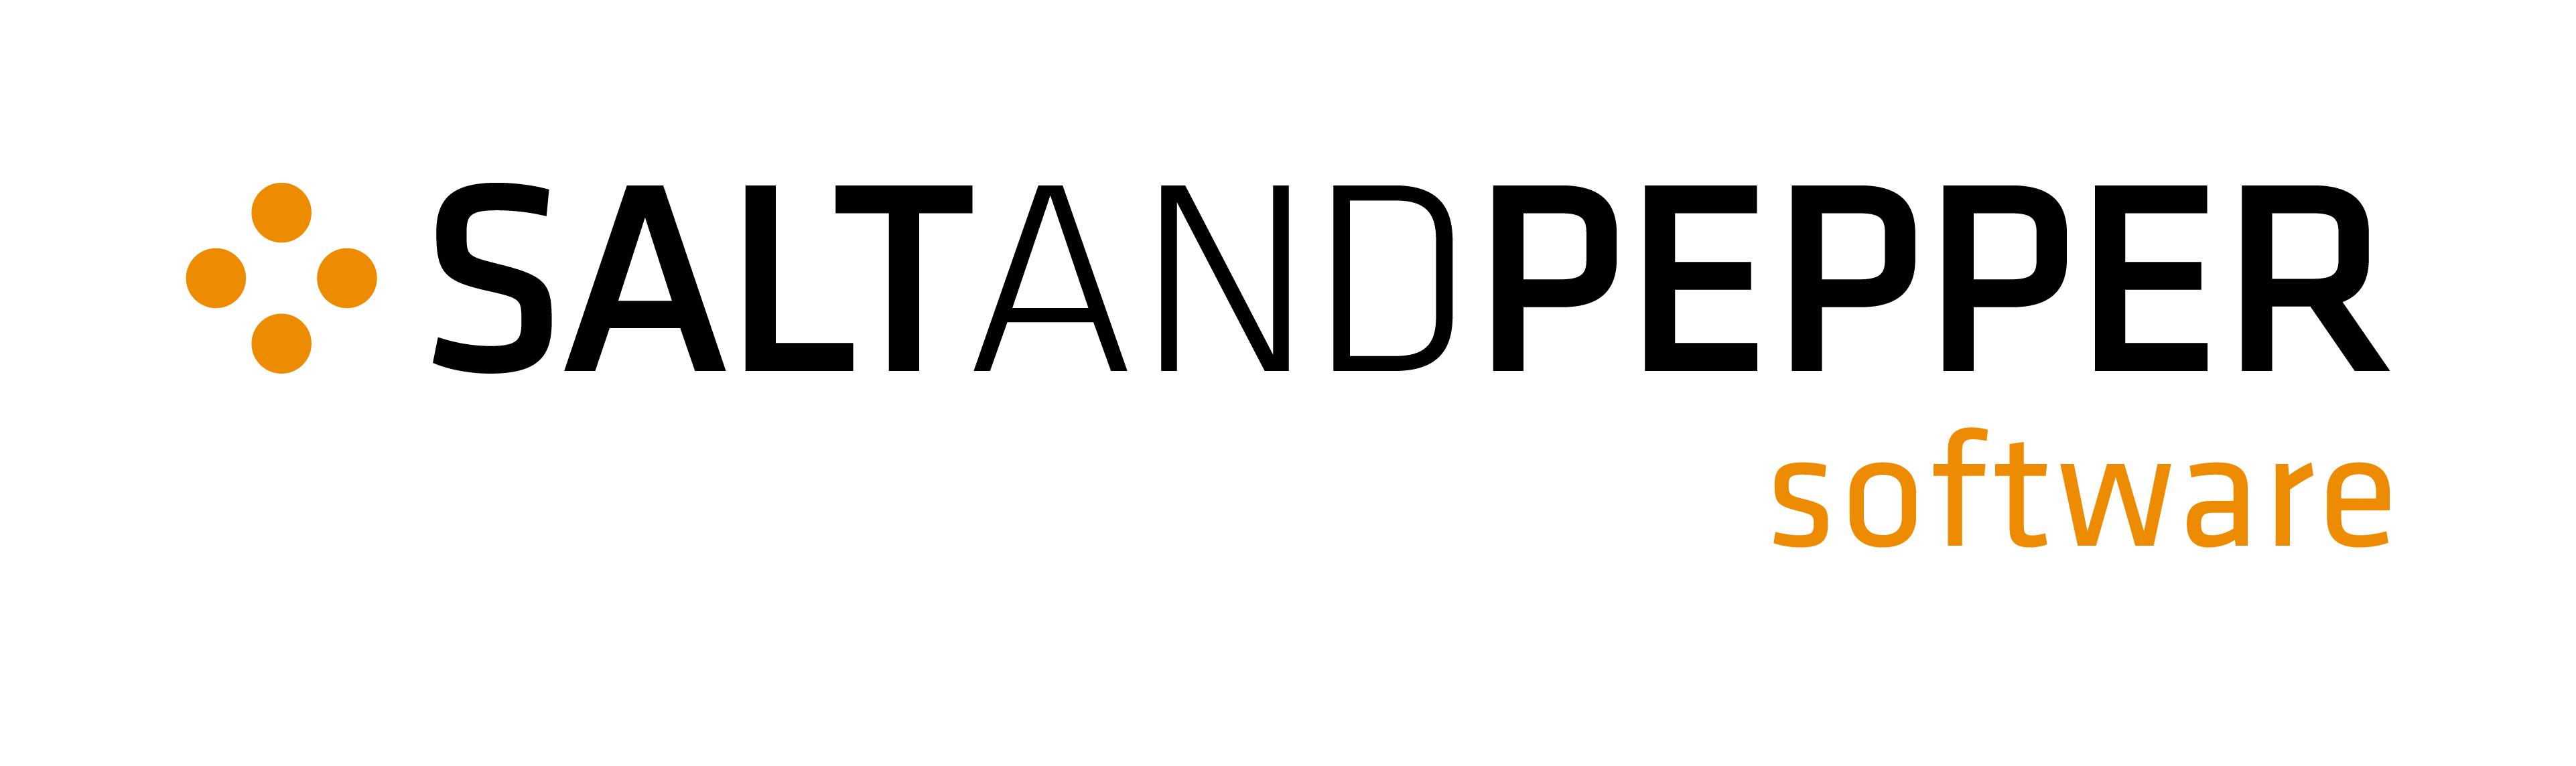 Sps logo rgb